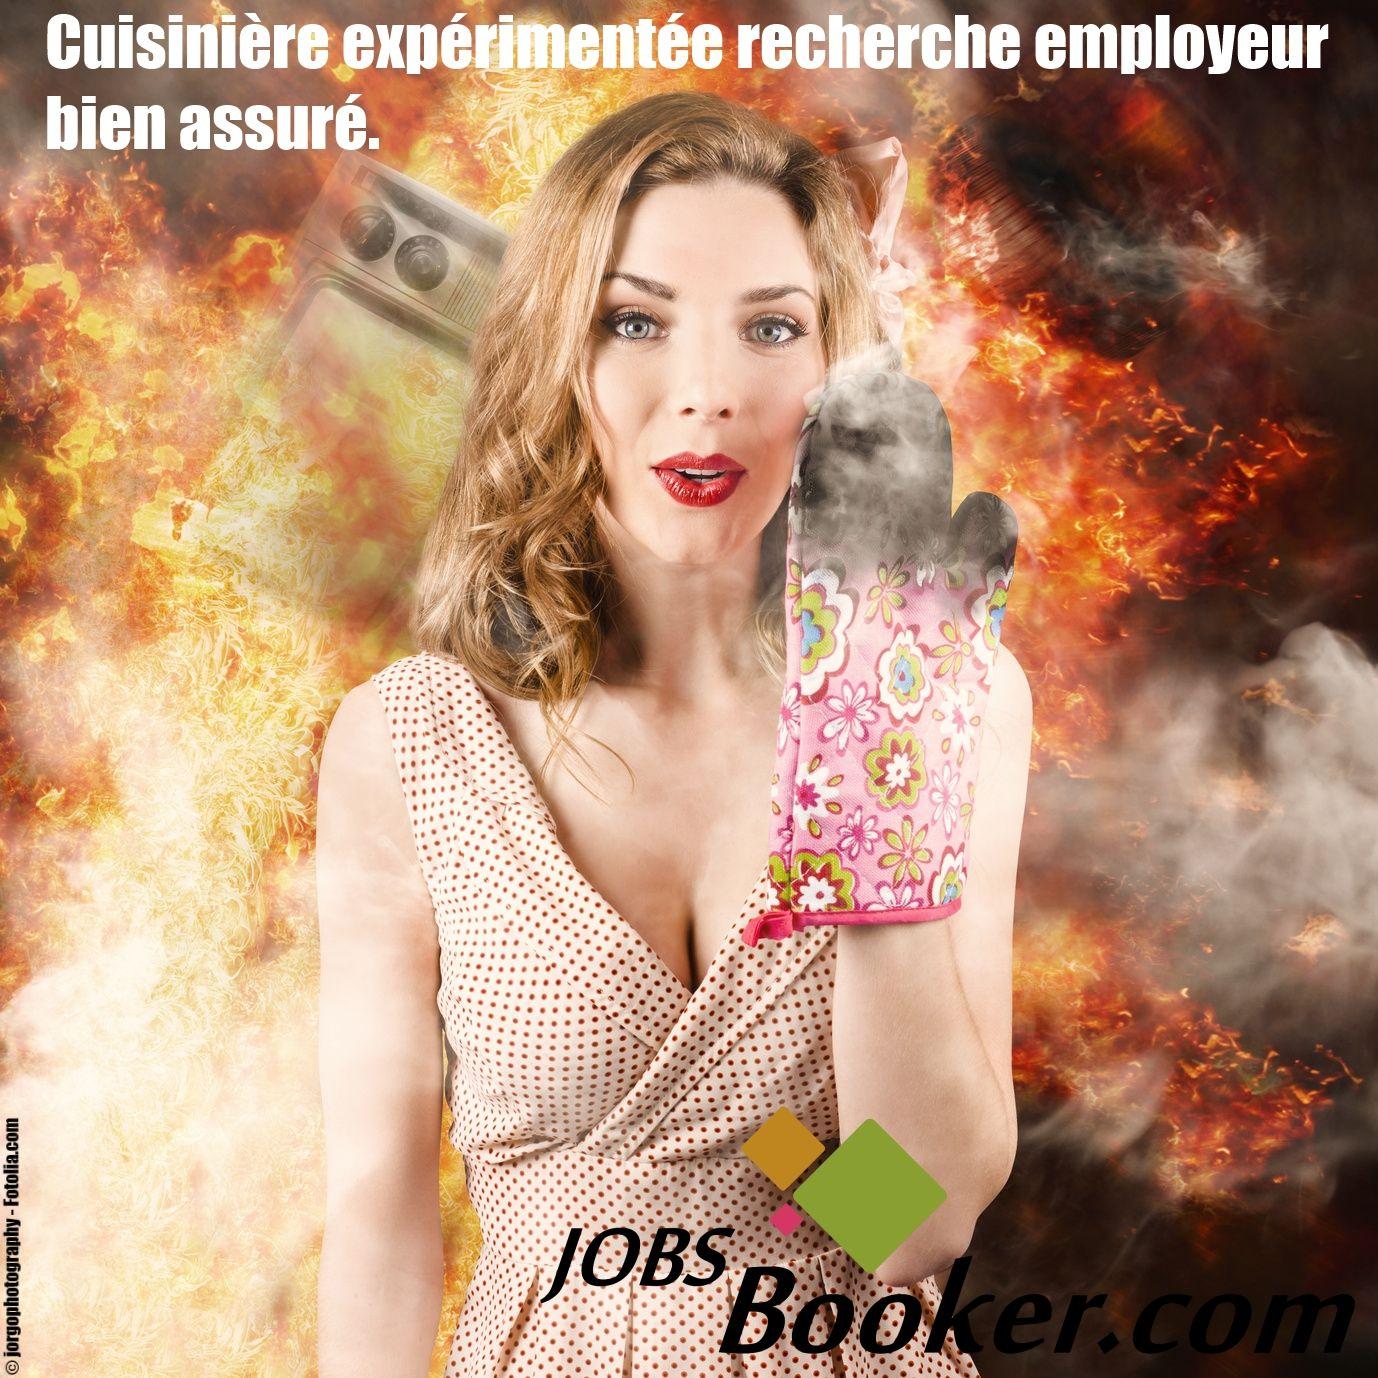 """Cuisinière expérimentée recherche employeur bien assuré"" #JobSurMesure #Emploi #JobsBooker"